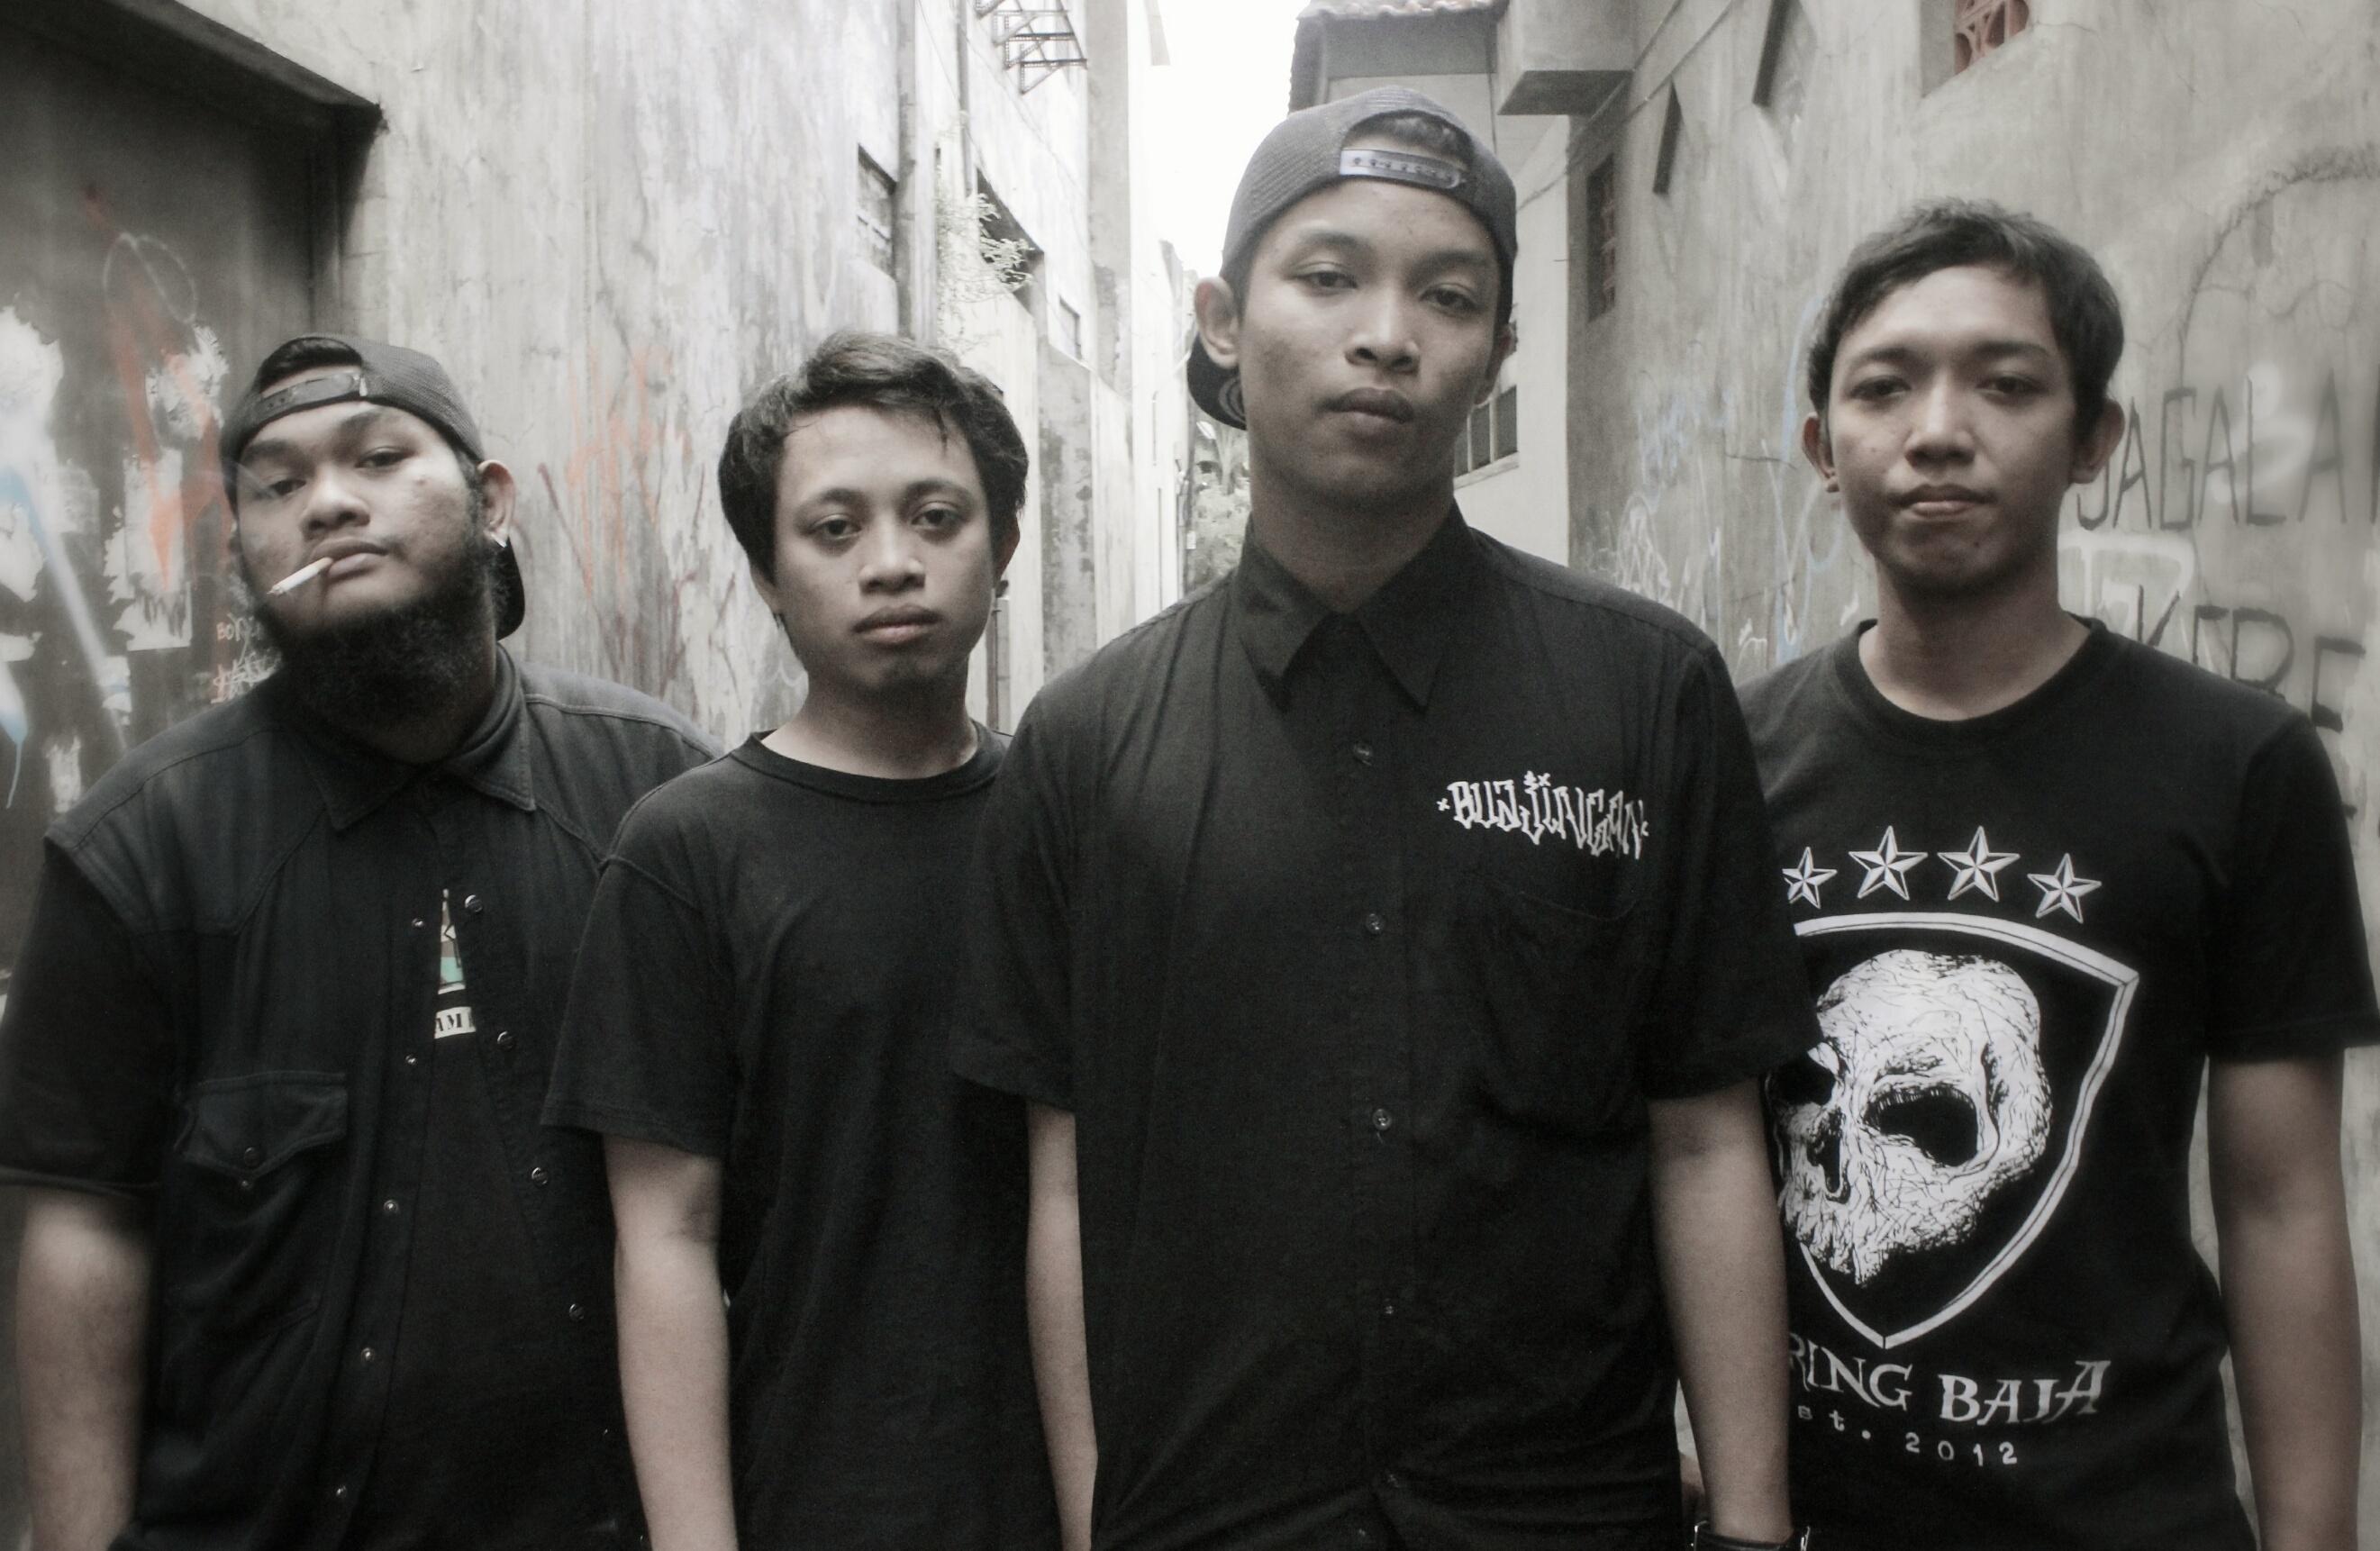 Black t shirt reverbnation - Black T Shirt Reverbnation 9